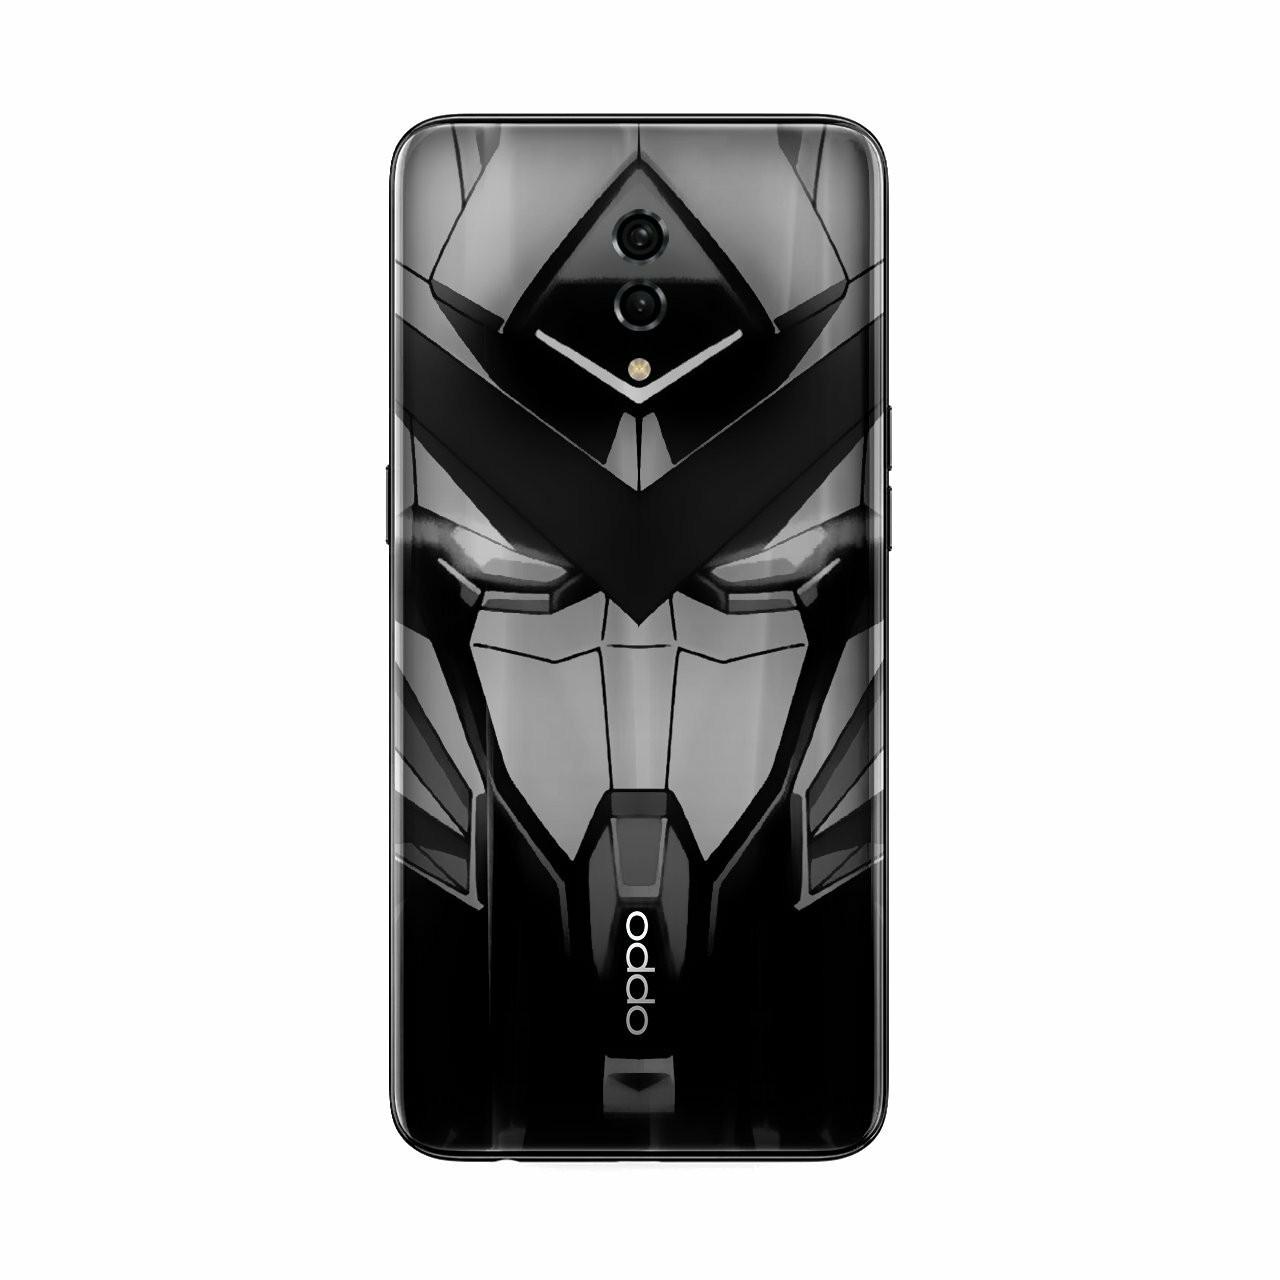 Oppo Gundam custom edition